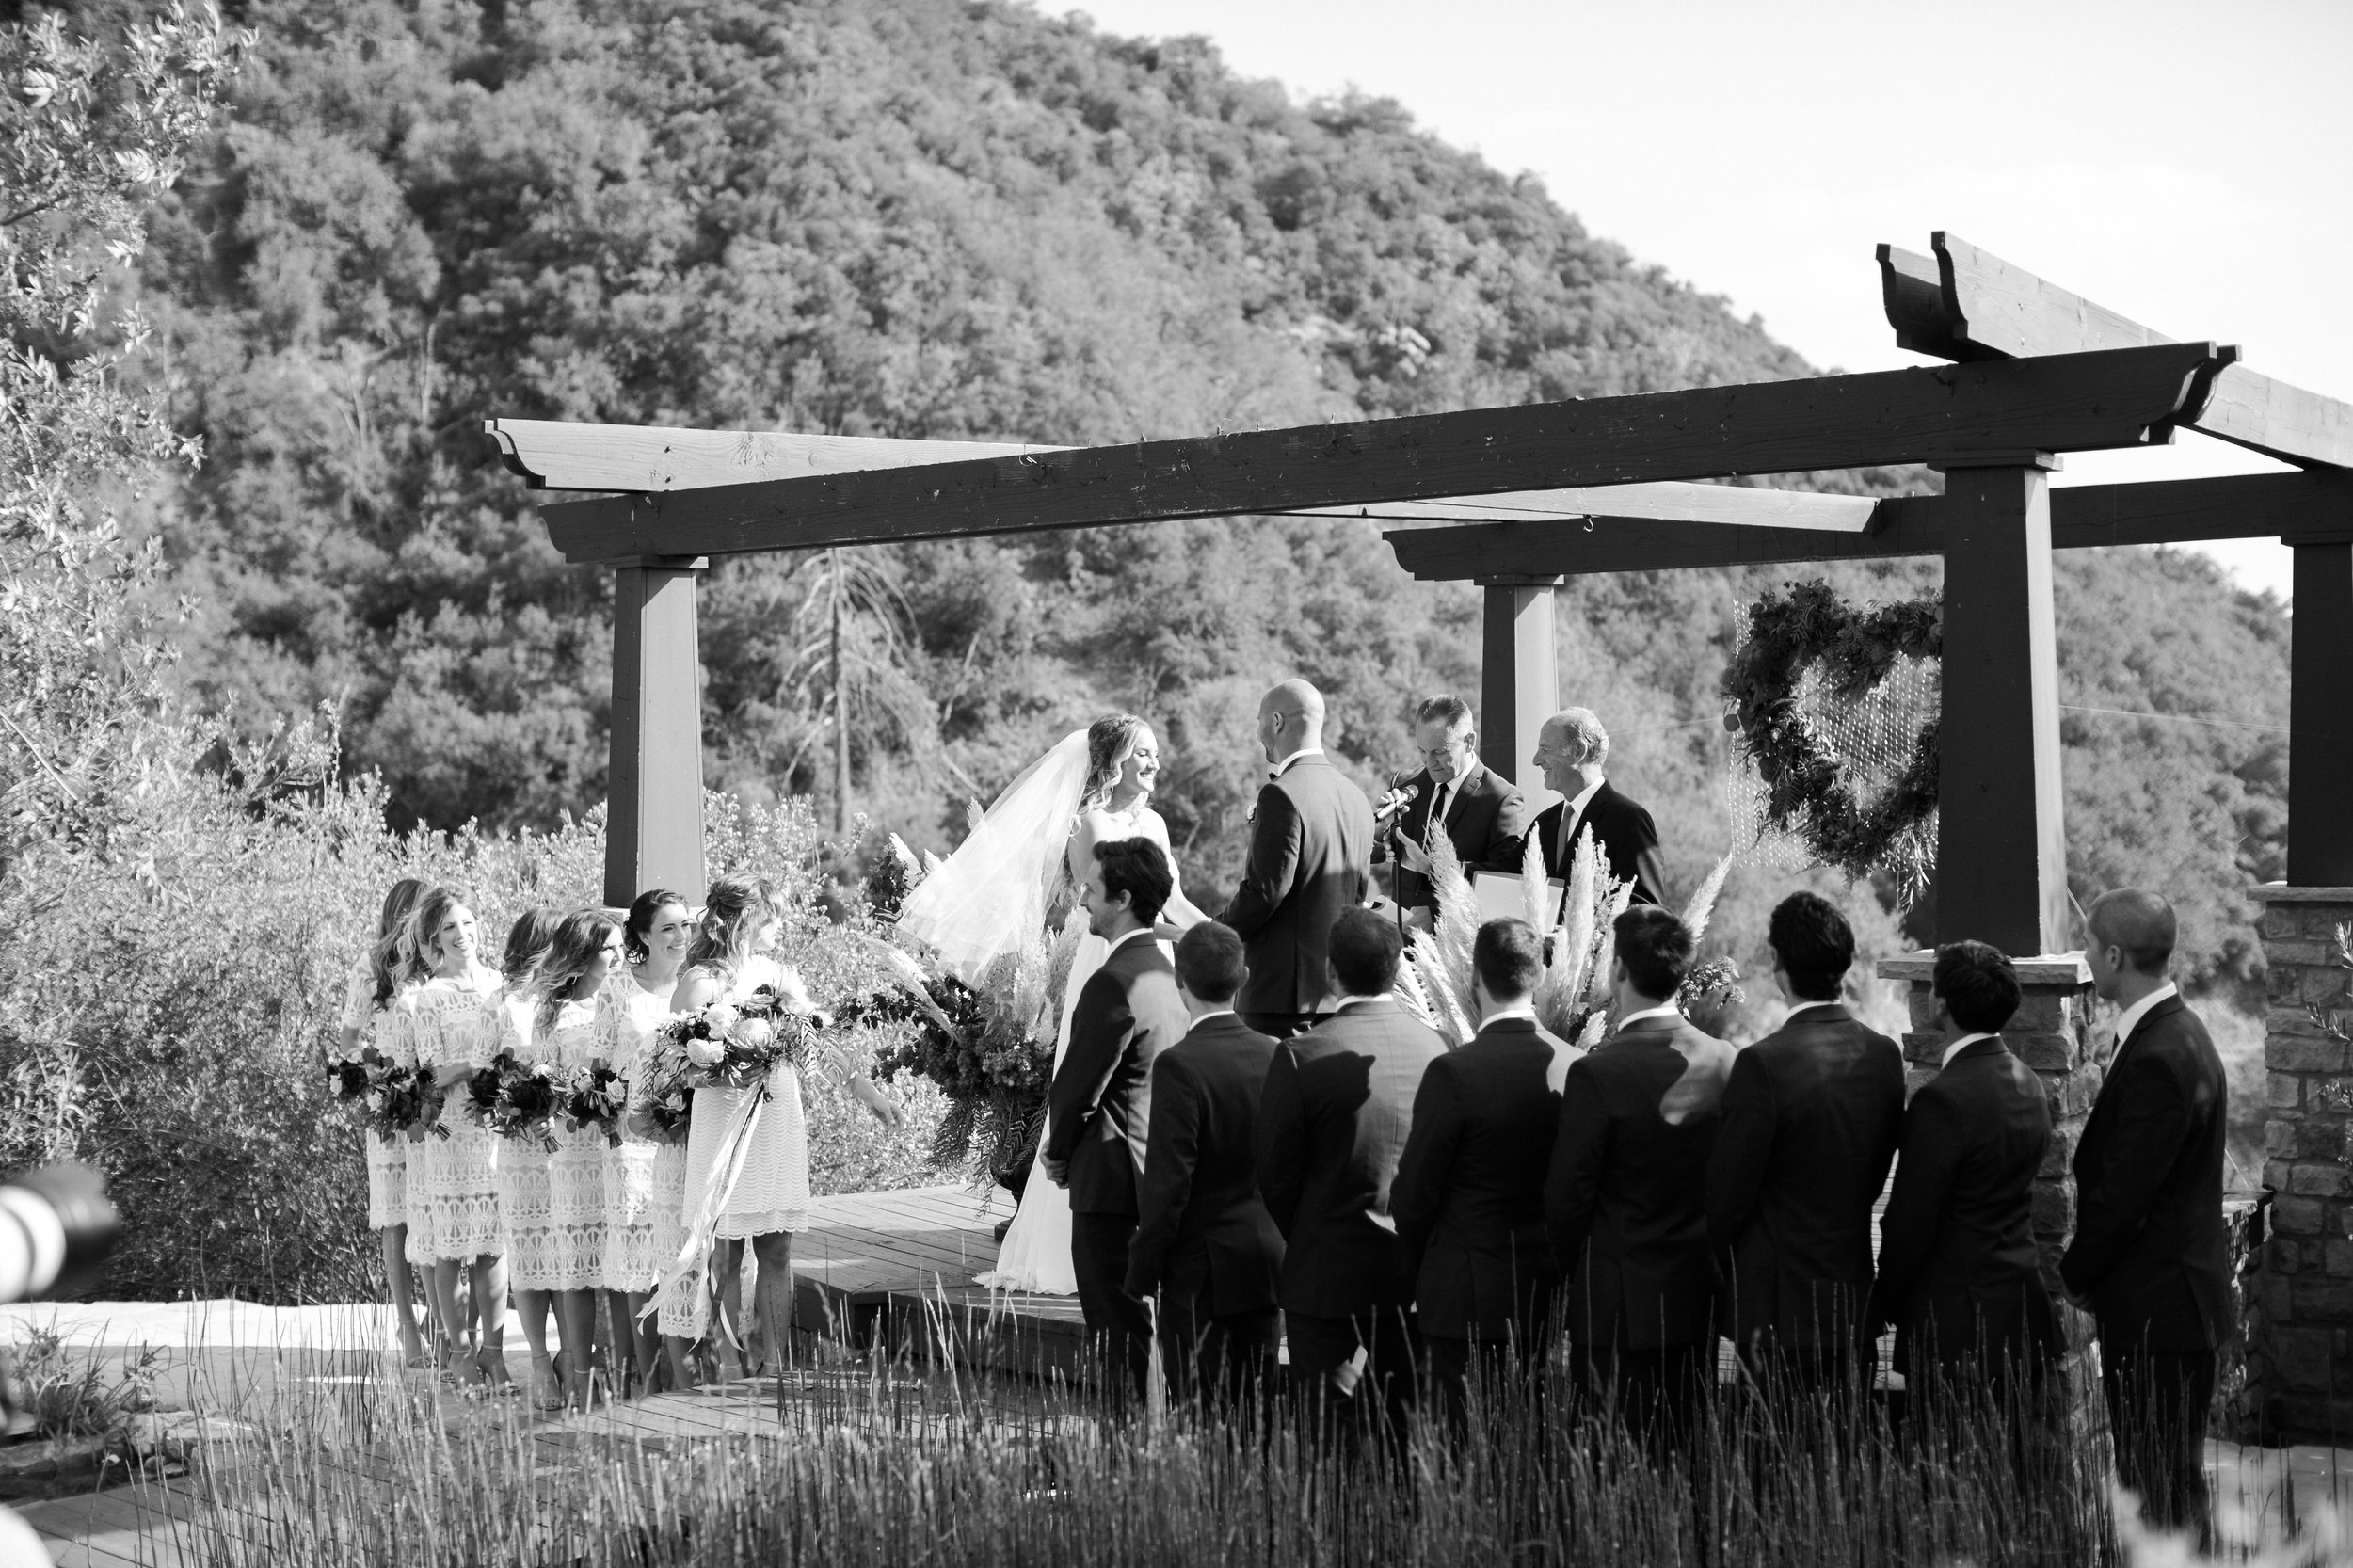 meganwelker-Pitluk-ceremony-98.jpg